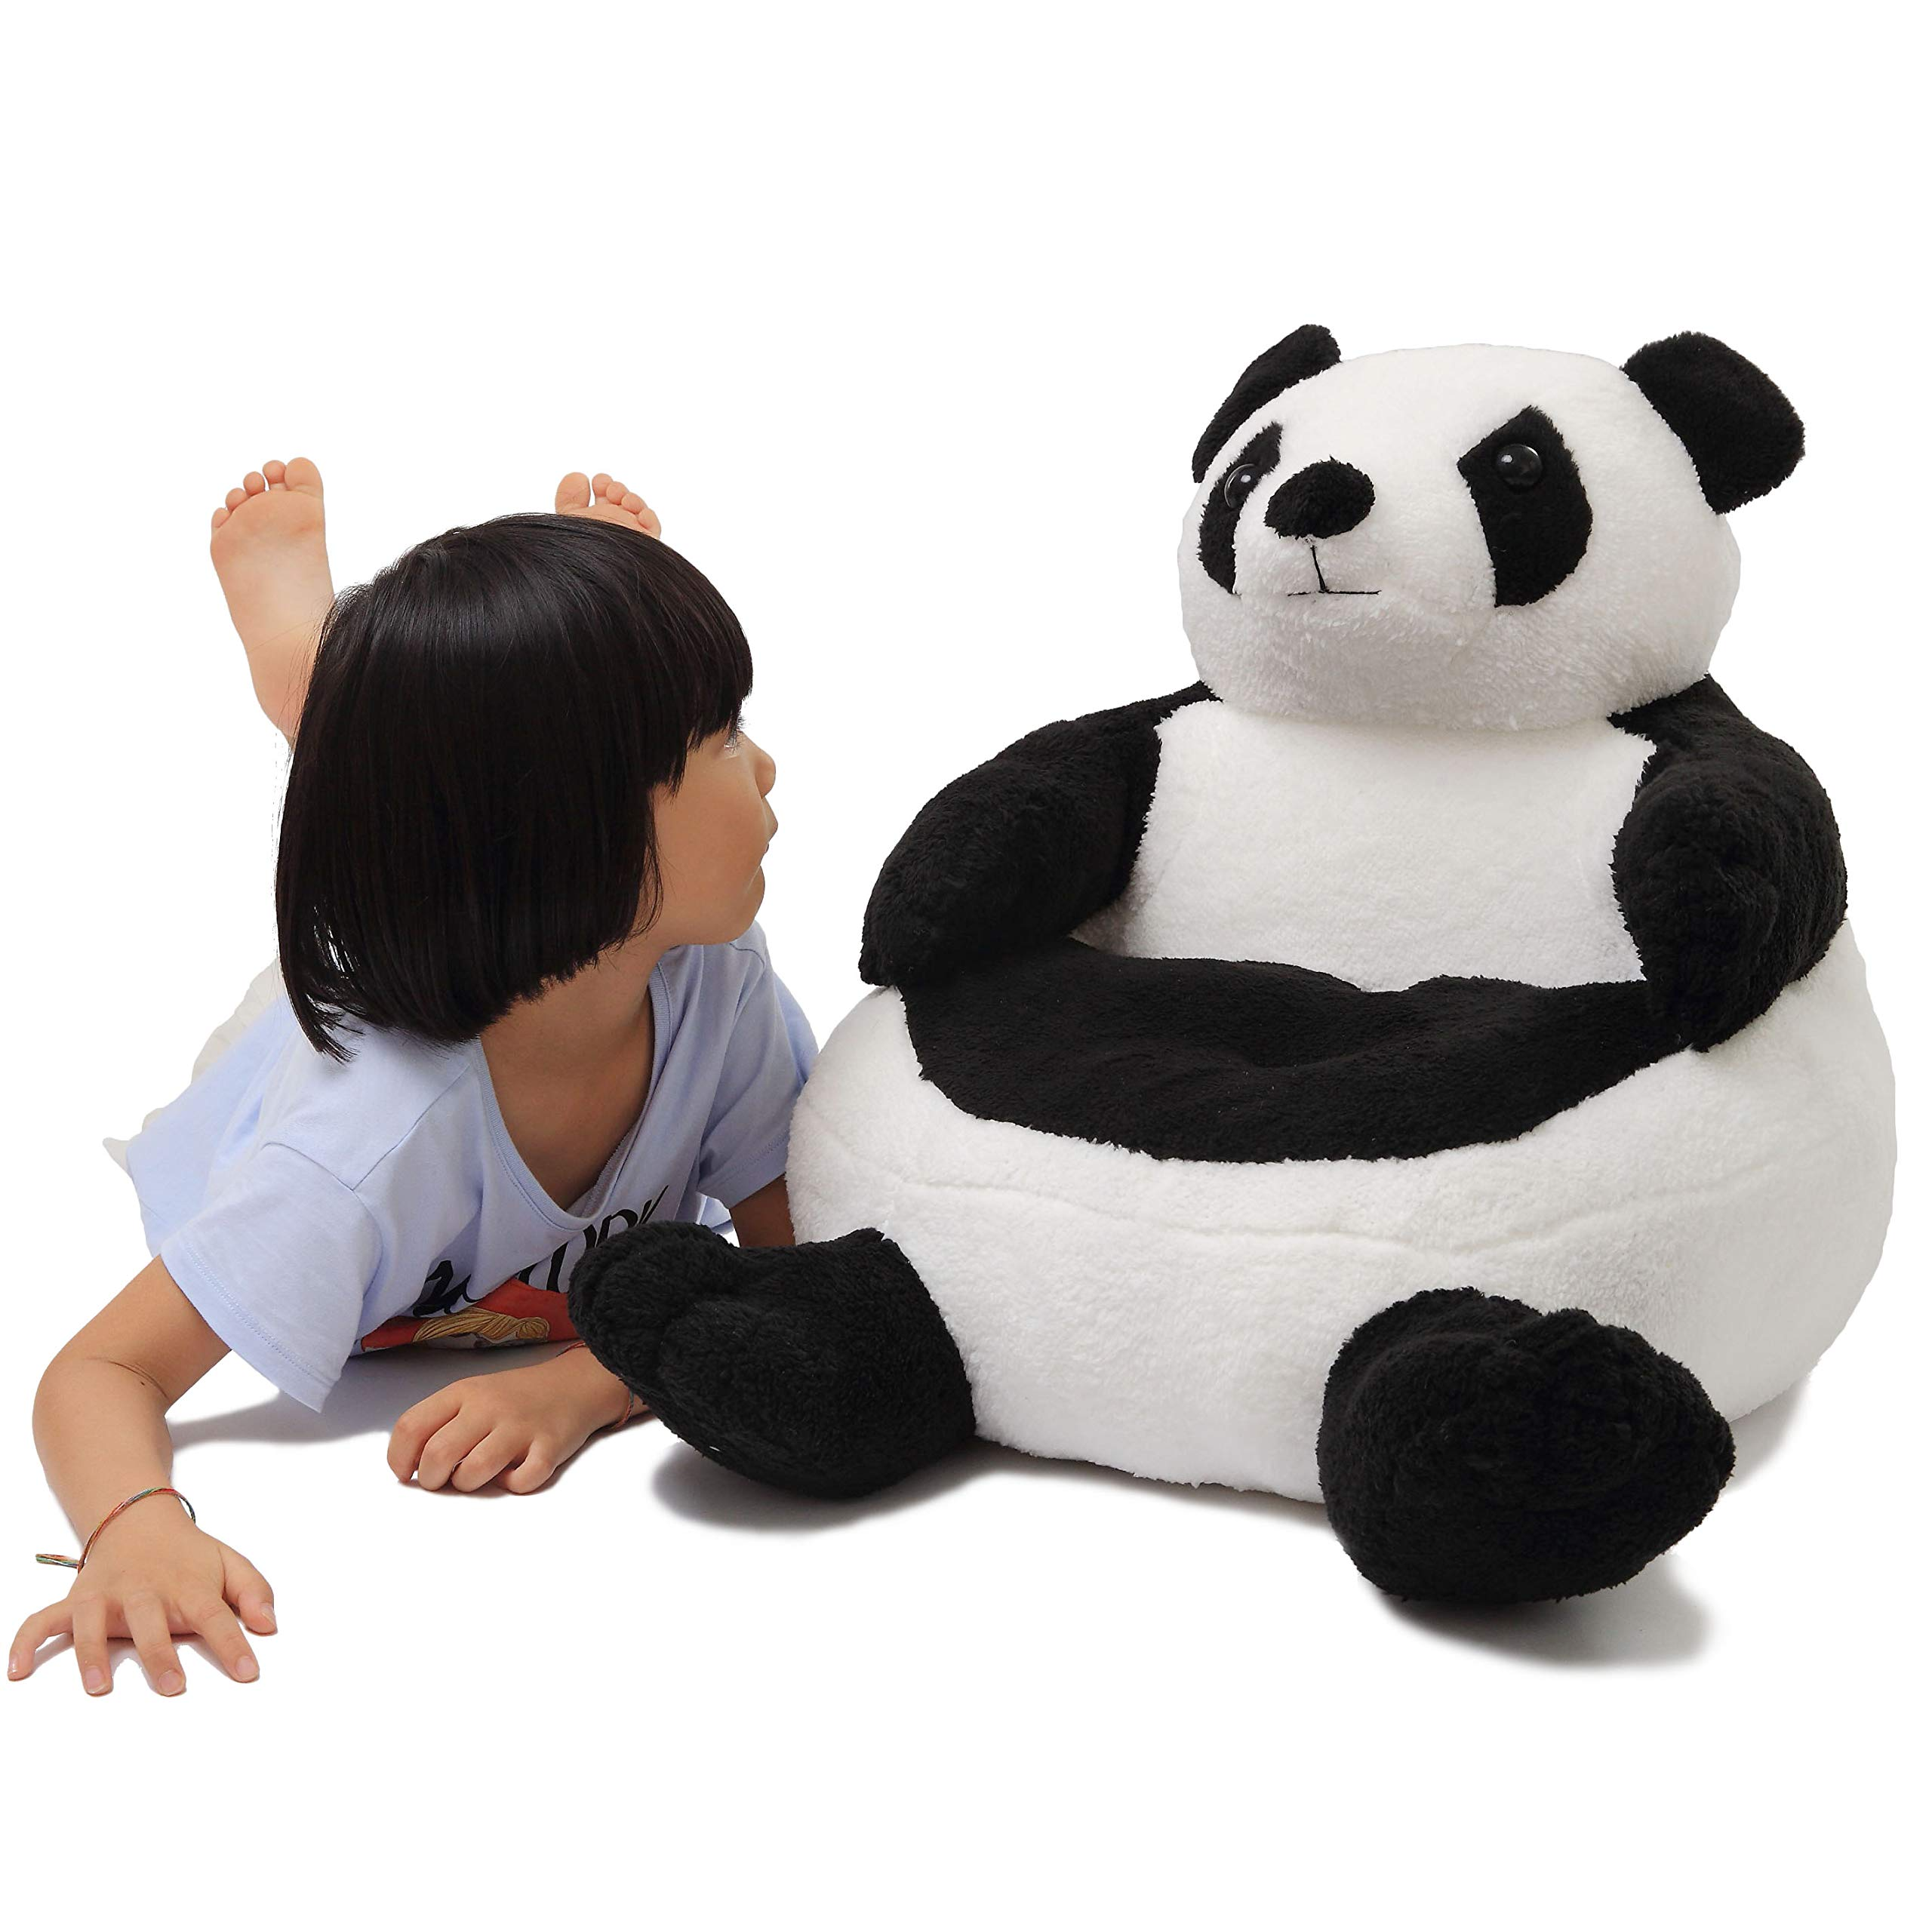 YXCSELL Furniture, Kids Chair PP Cotton Cartoon Panda Animal Lovely Character Sofa, Seat Pad Circular Soft Comfortable Kids Sofa